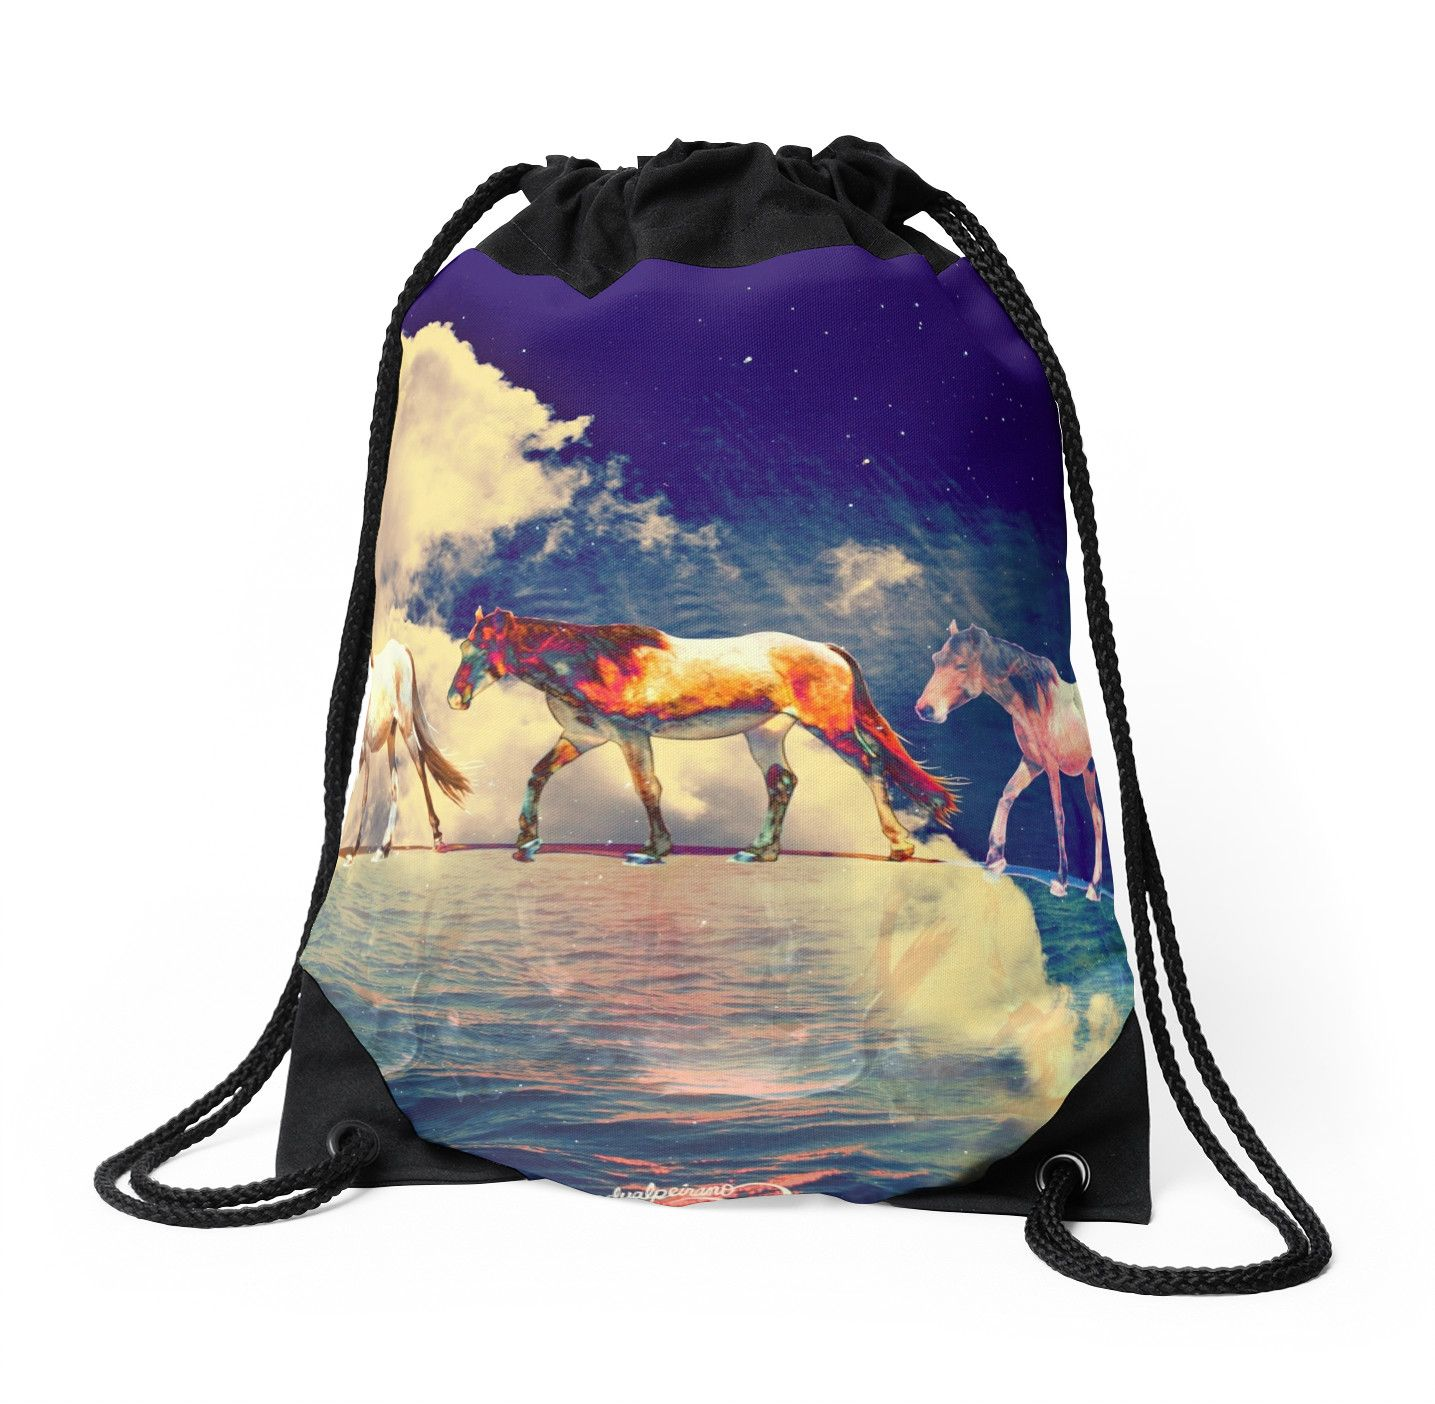 Cavalli lunari by Bizzartino